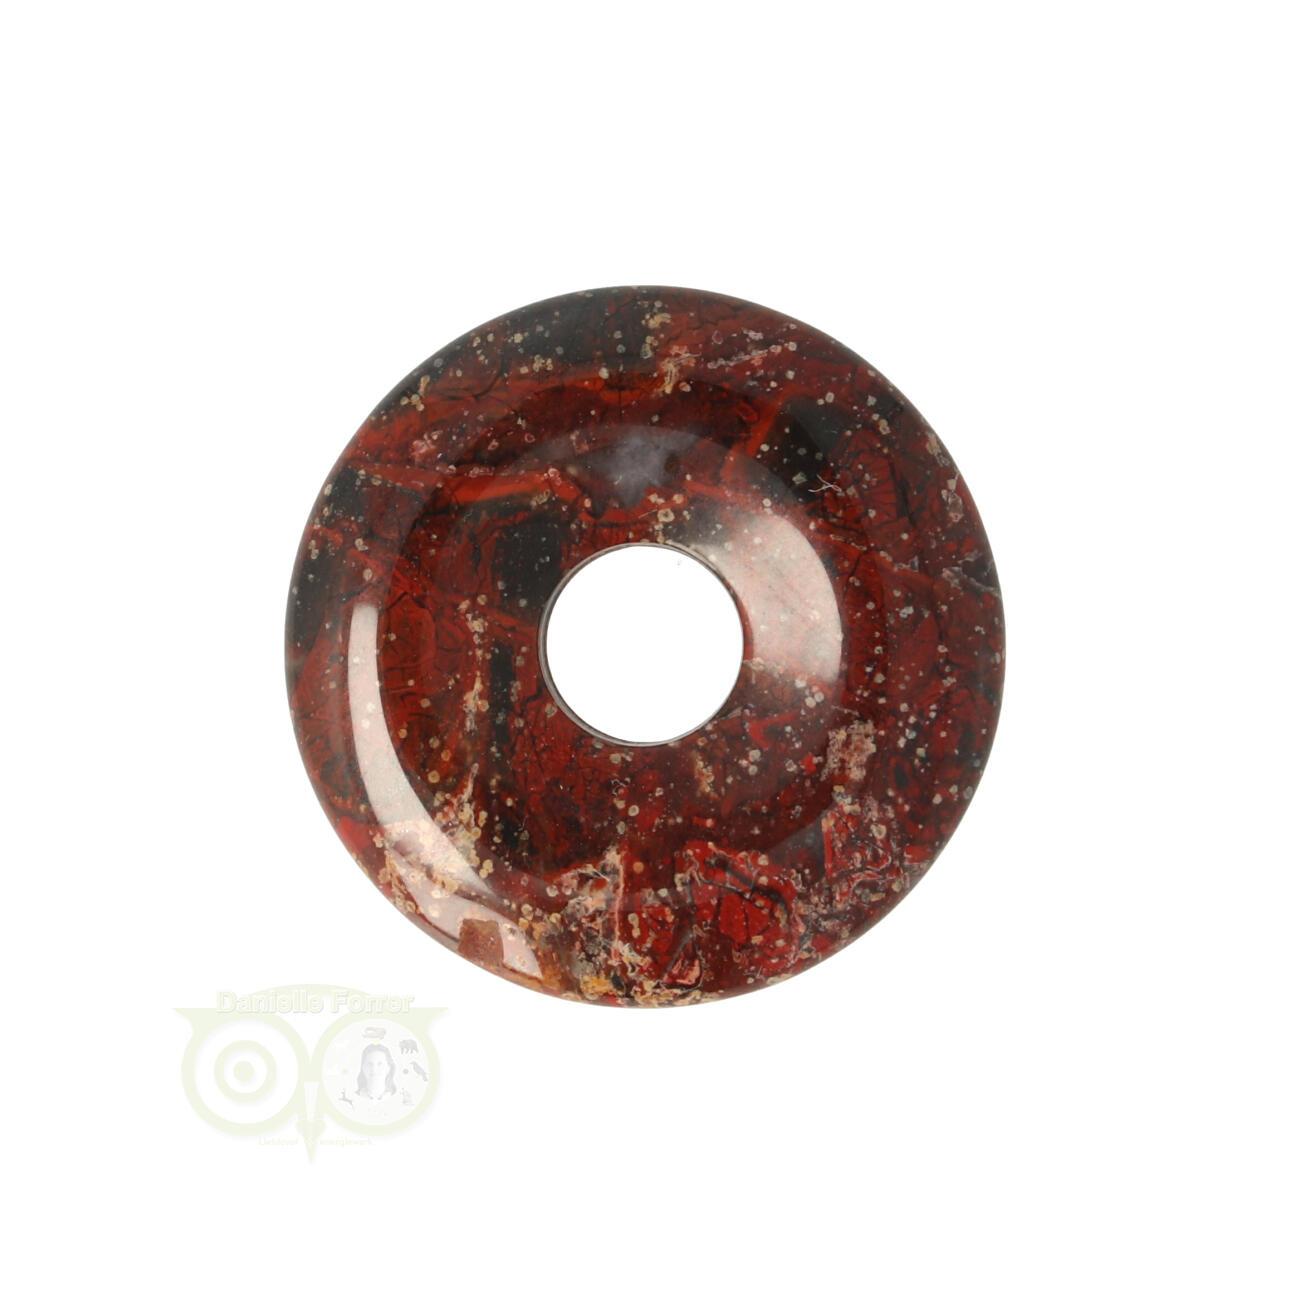 Jaspis Breccie Edelstenen donut hanger | Edelstenen Webwinkel - Webshop Danielle Forrer